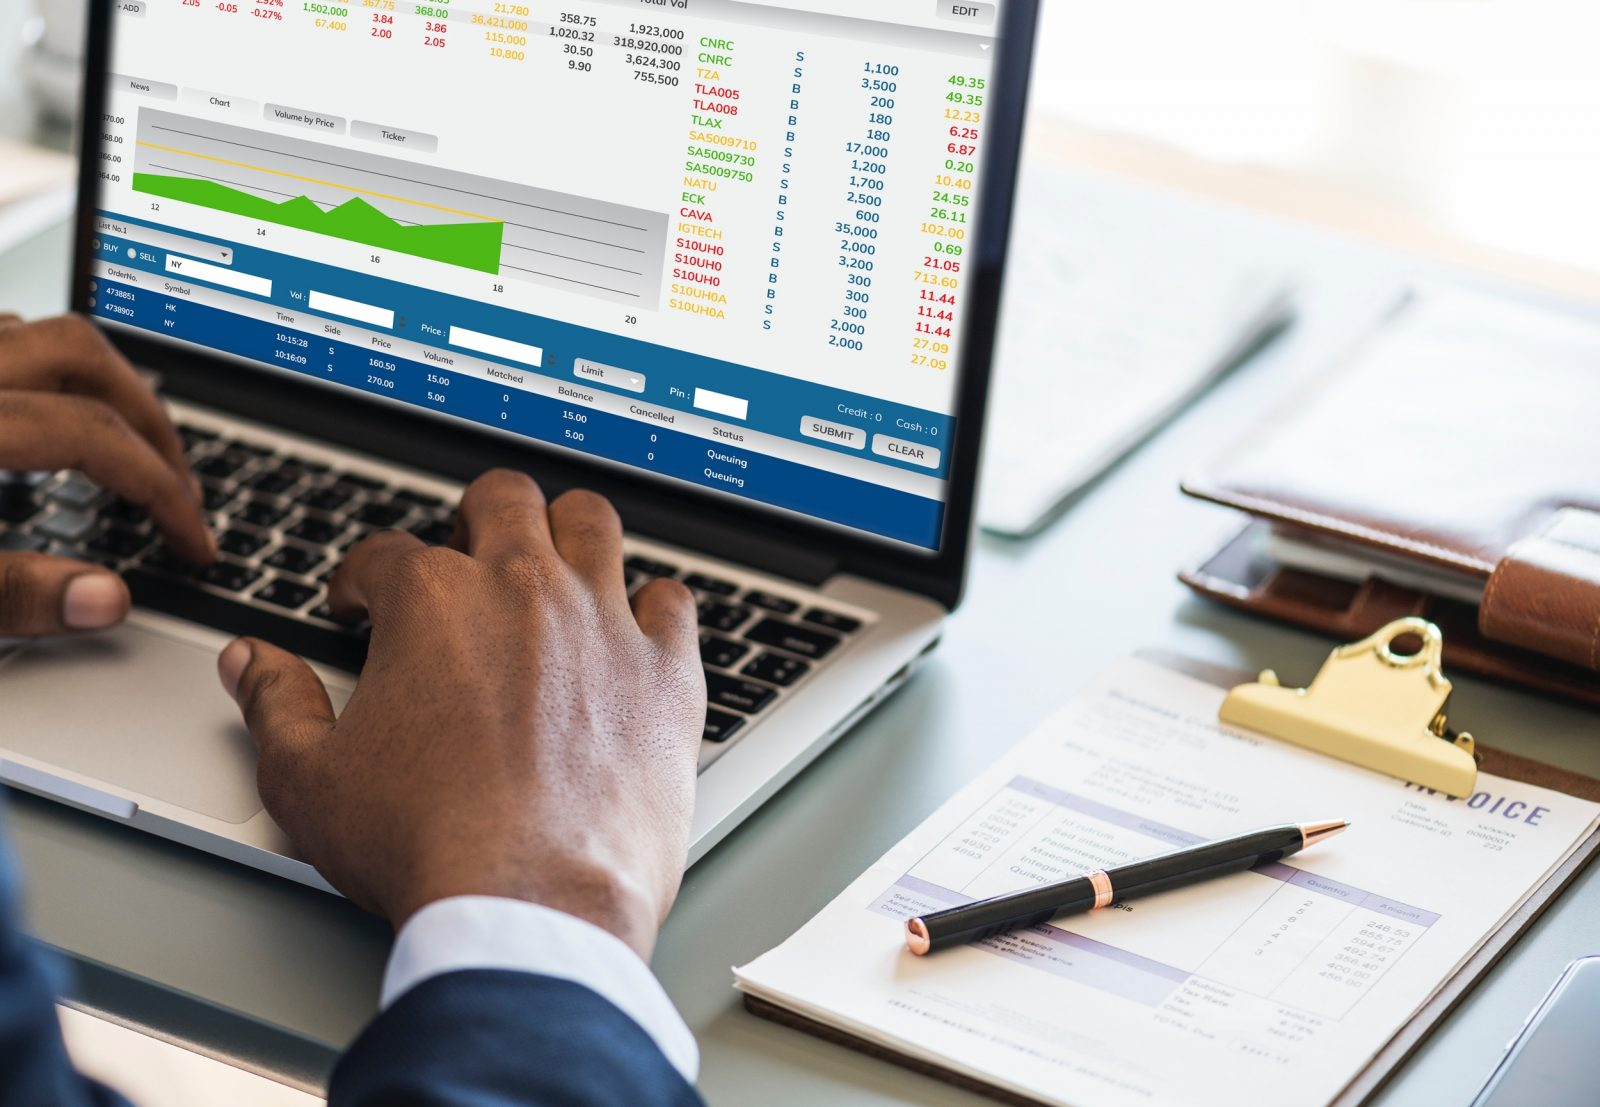 Manfaat Evaluasi Kinerja Keuangan Perusahaan Bagi HR